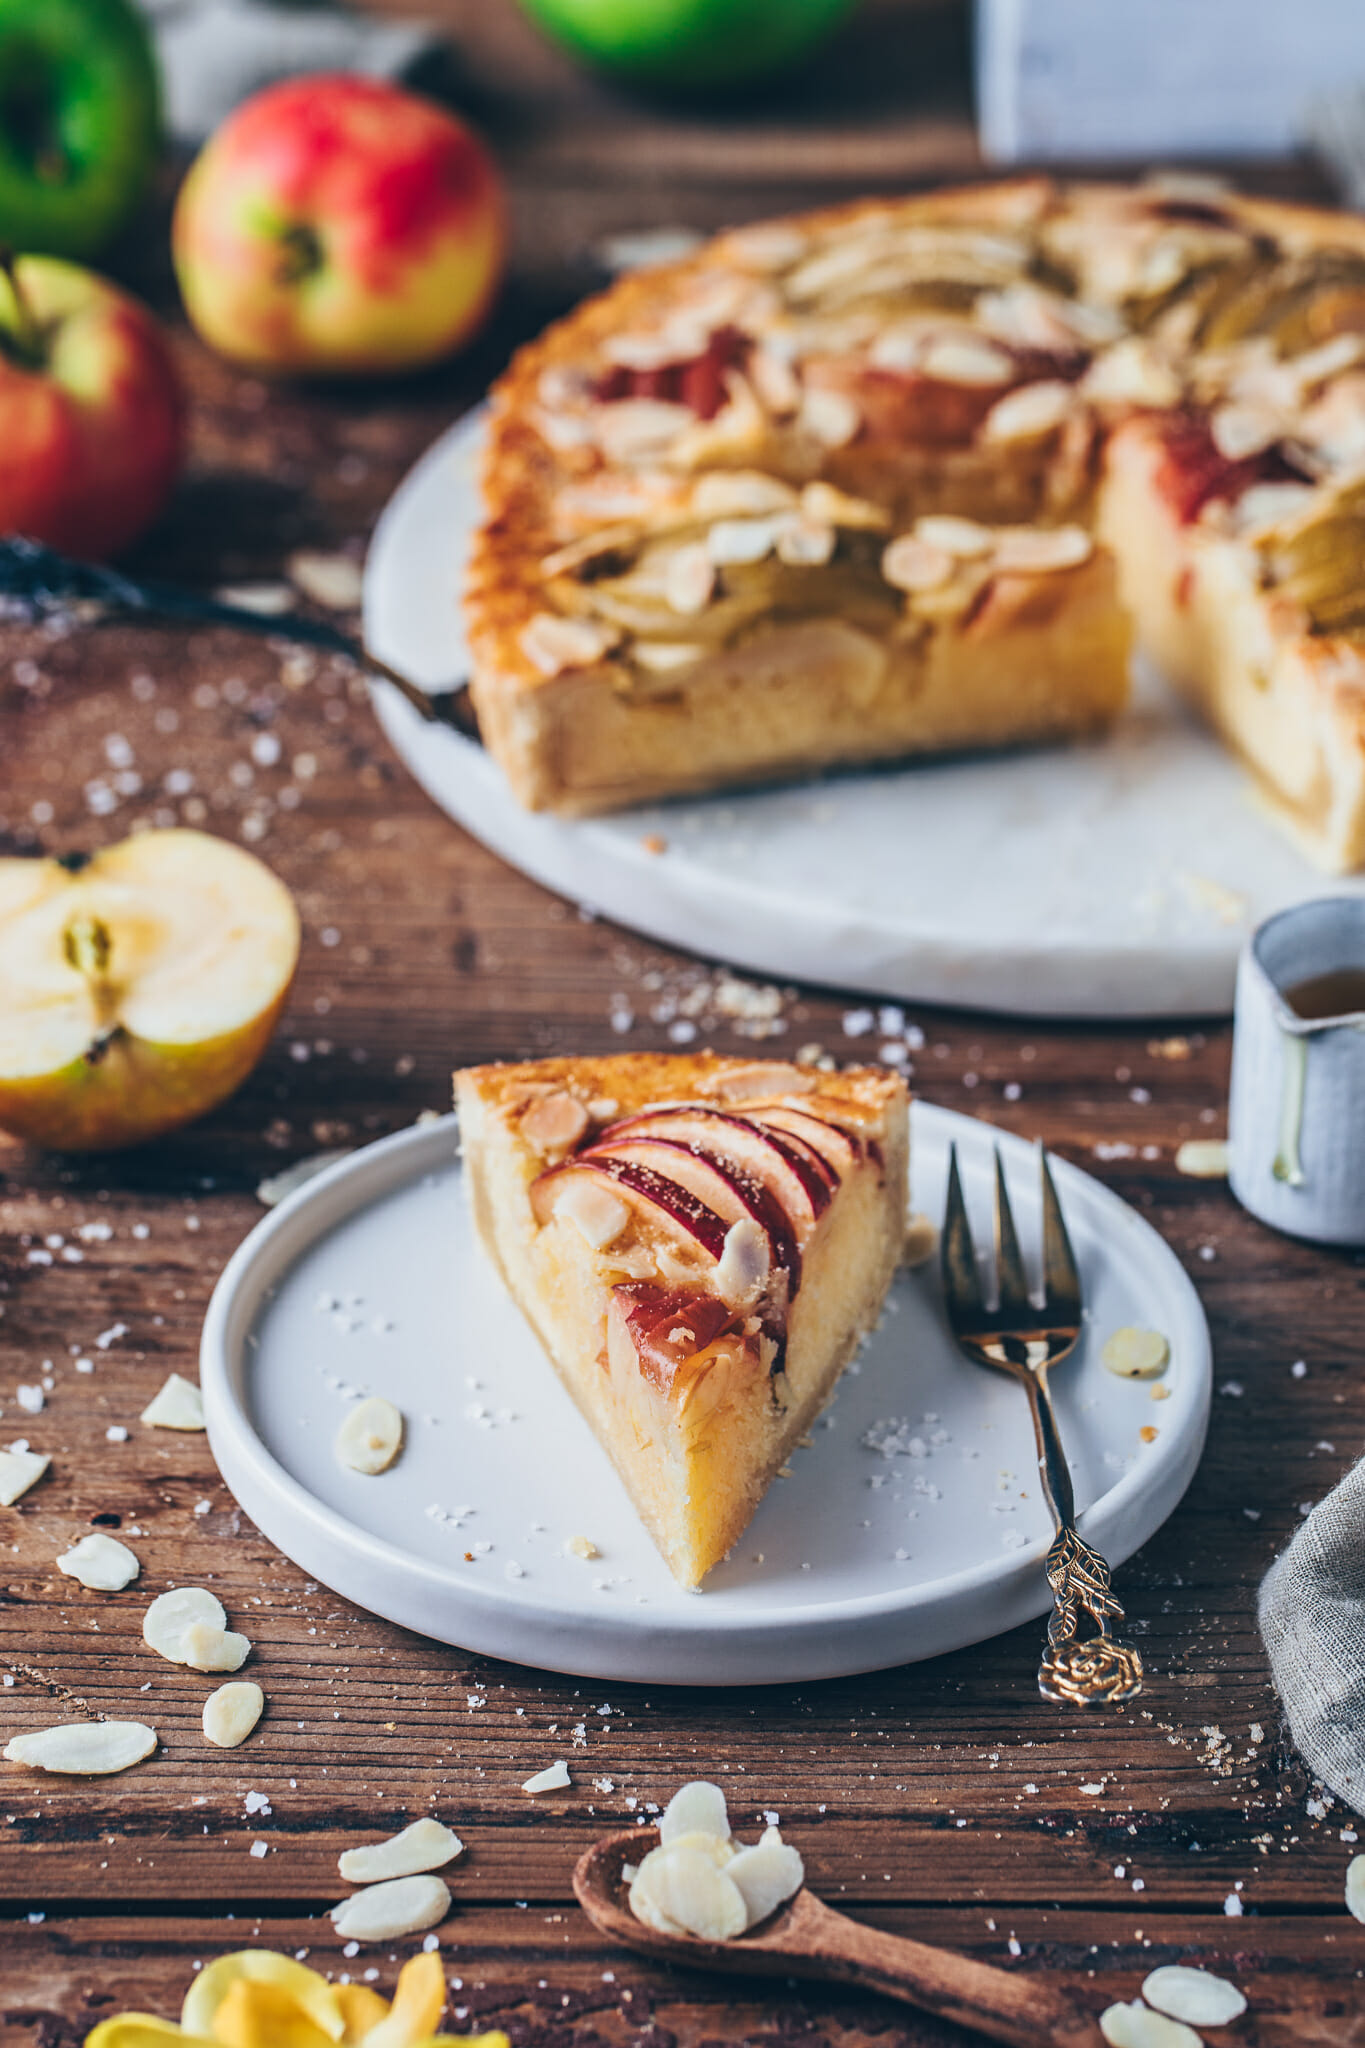 Vegan Apple Frangipane Tart with almonds